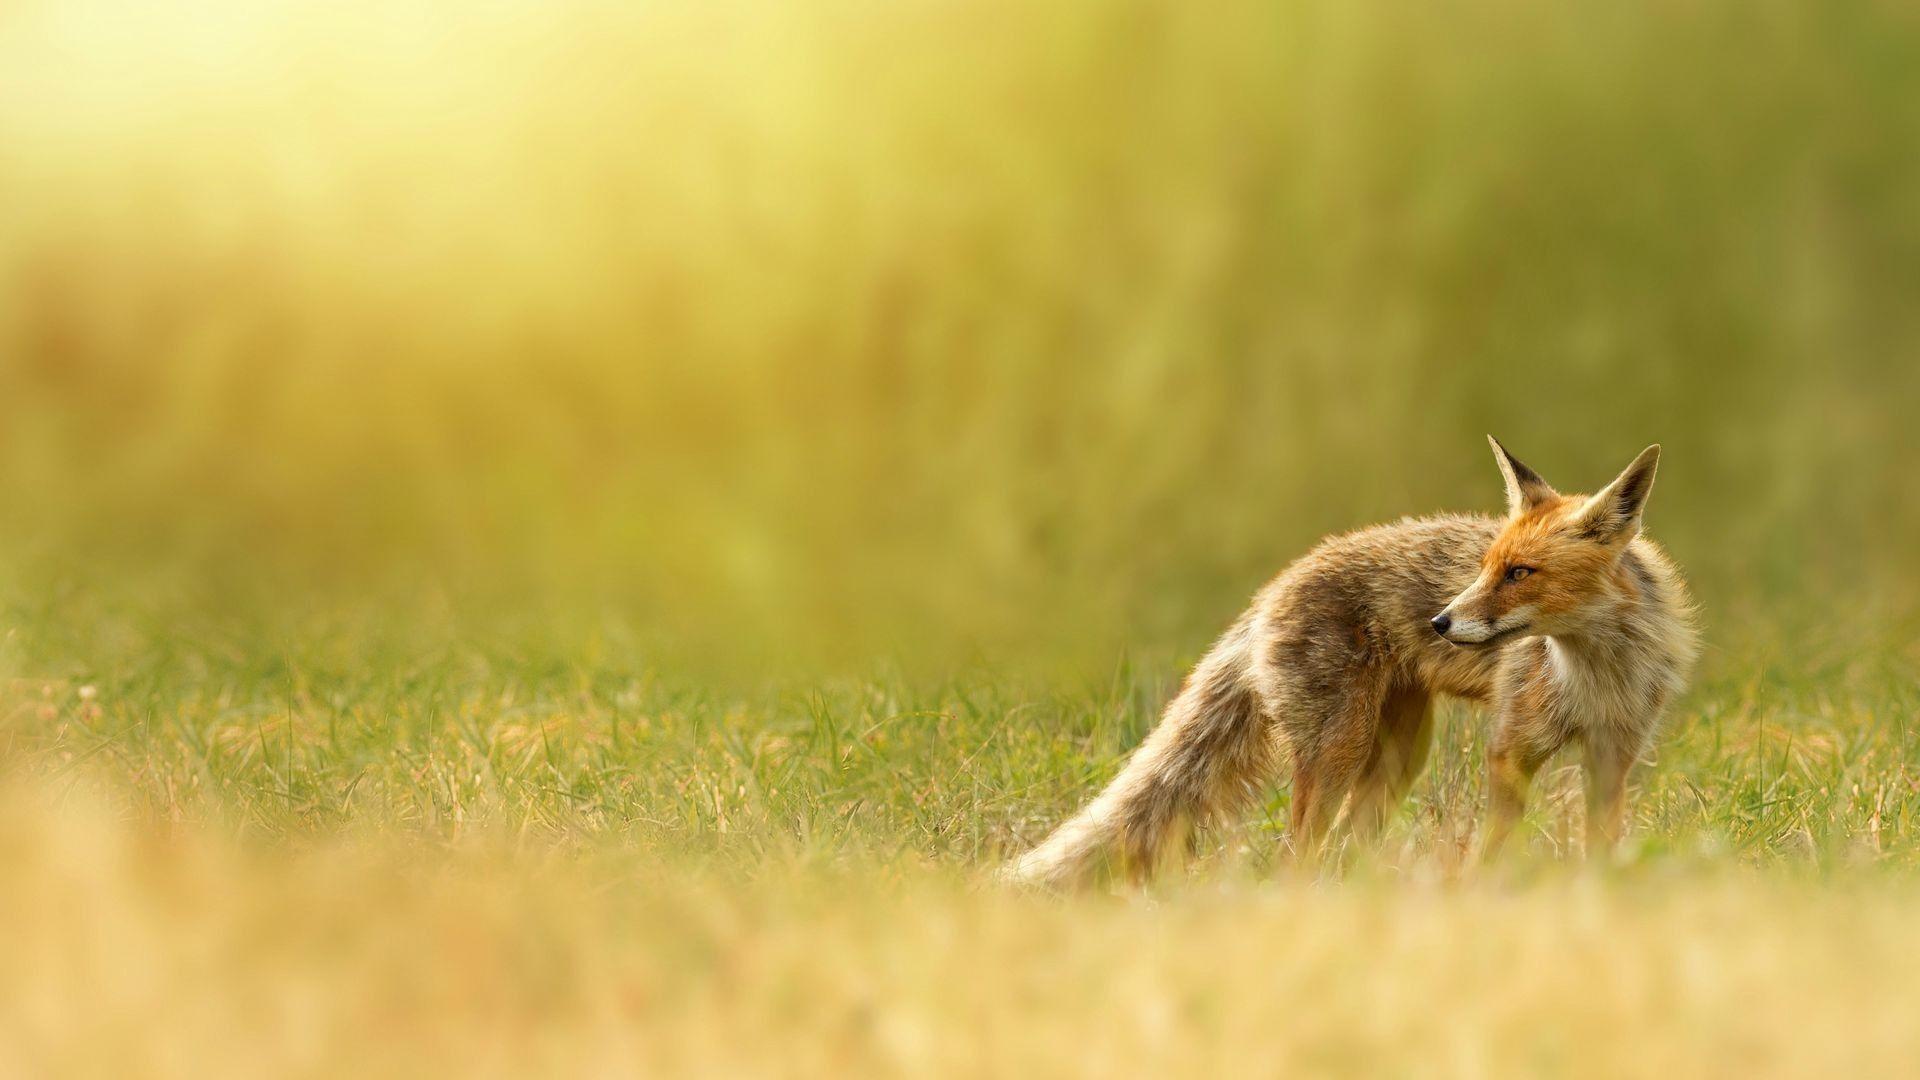 fox wallpapers, red fox, red, nature, grass | HD Desktop Wallpapers